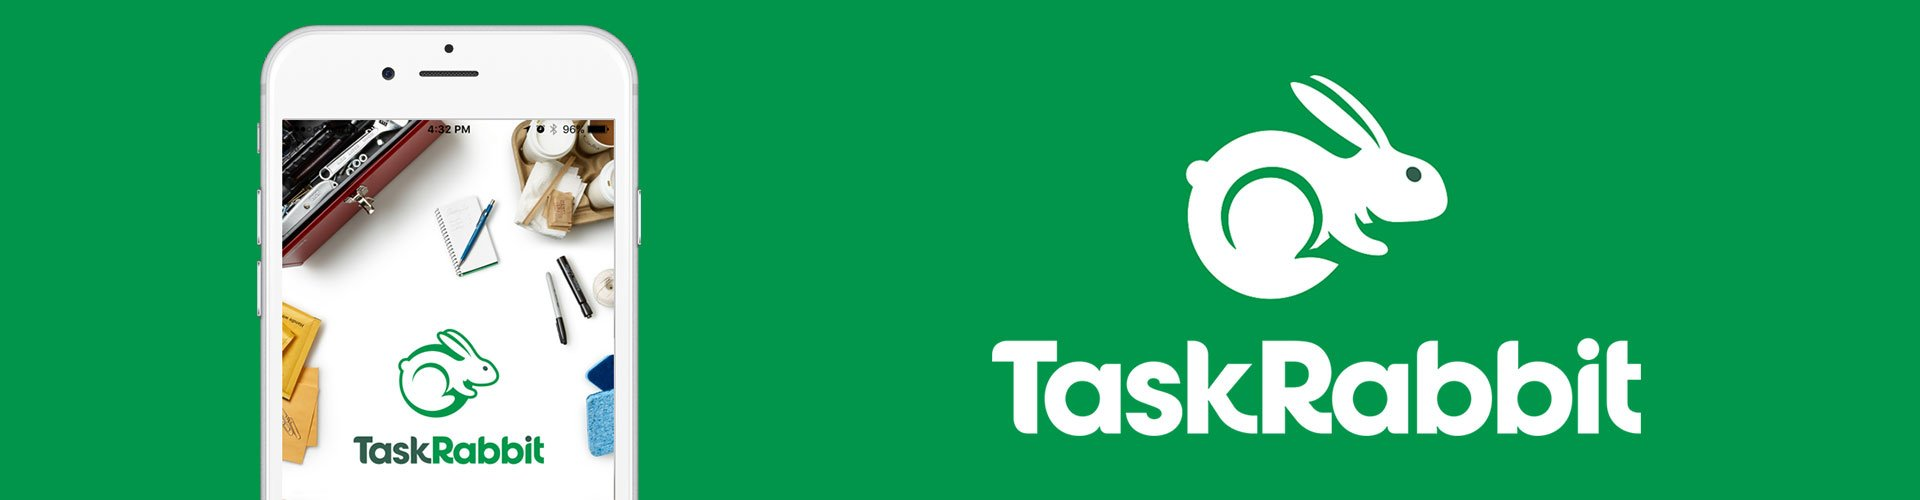 app like taskrabbit